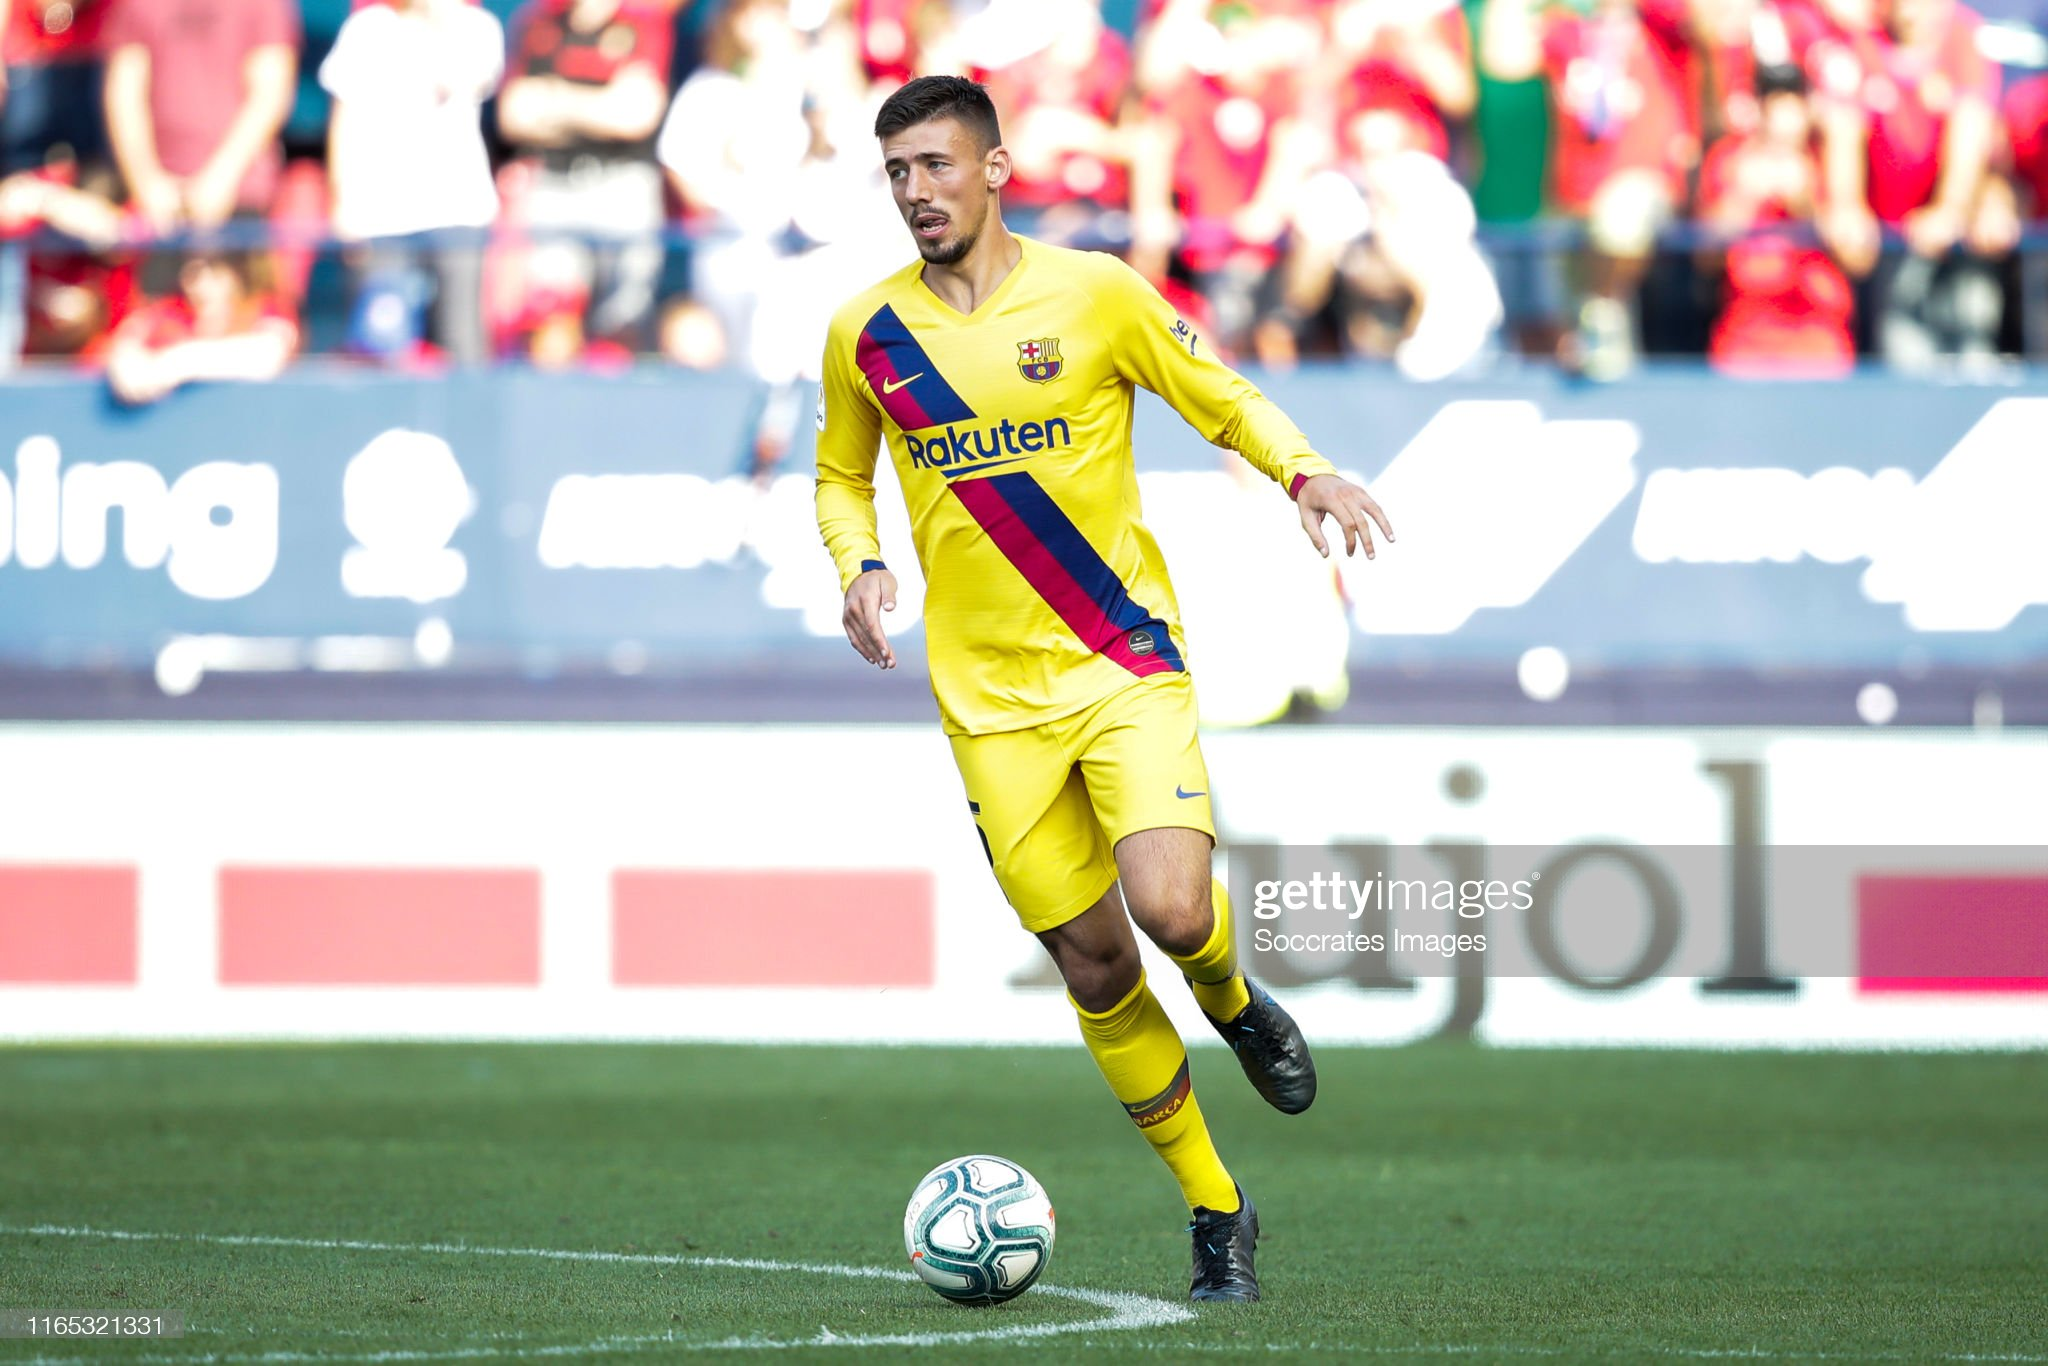 صور مباراة : أوساسونا - برشلونة 2-2 ( 31-08-2019 )  Clement-lenglet-of-fc-barcelona-during-the-la-liga-santander-match-picture-id1165321331?s=2048x2048